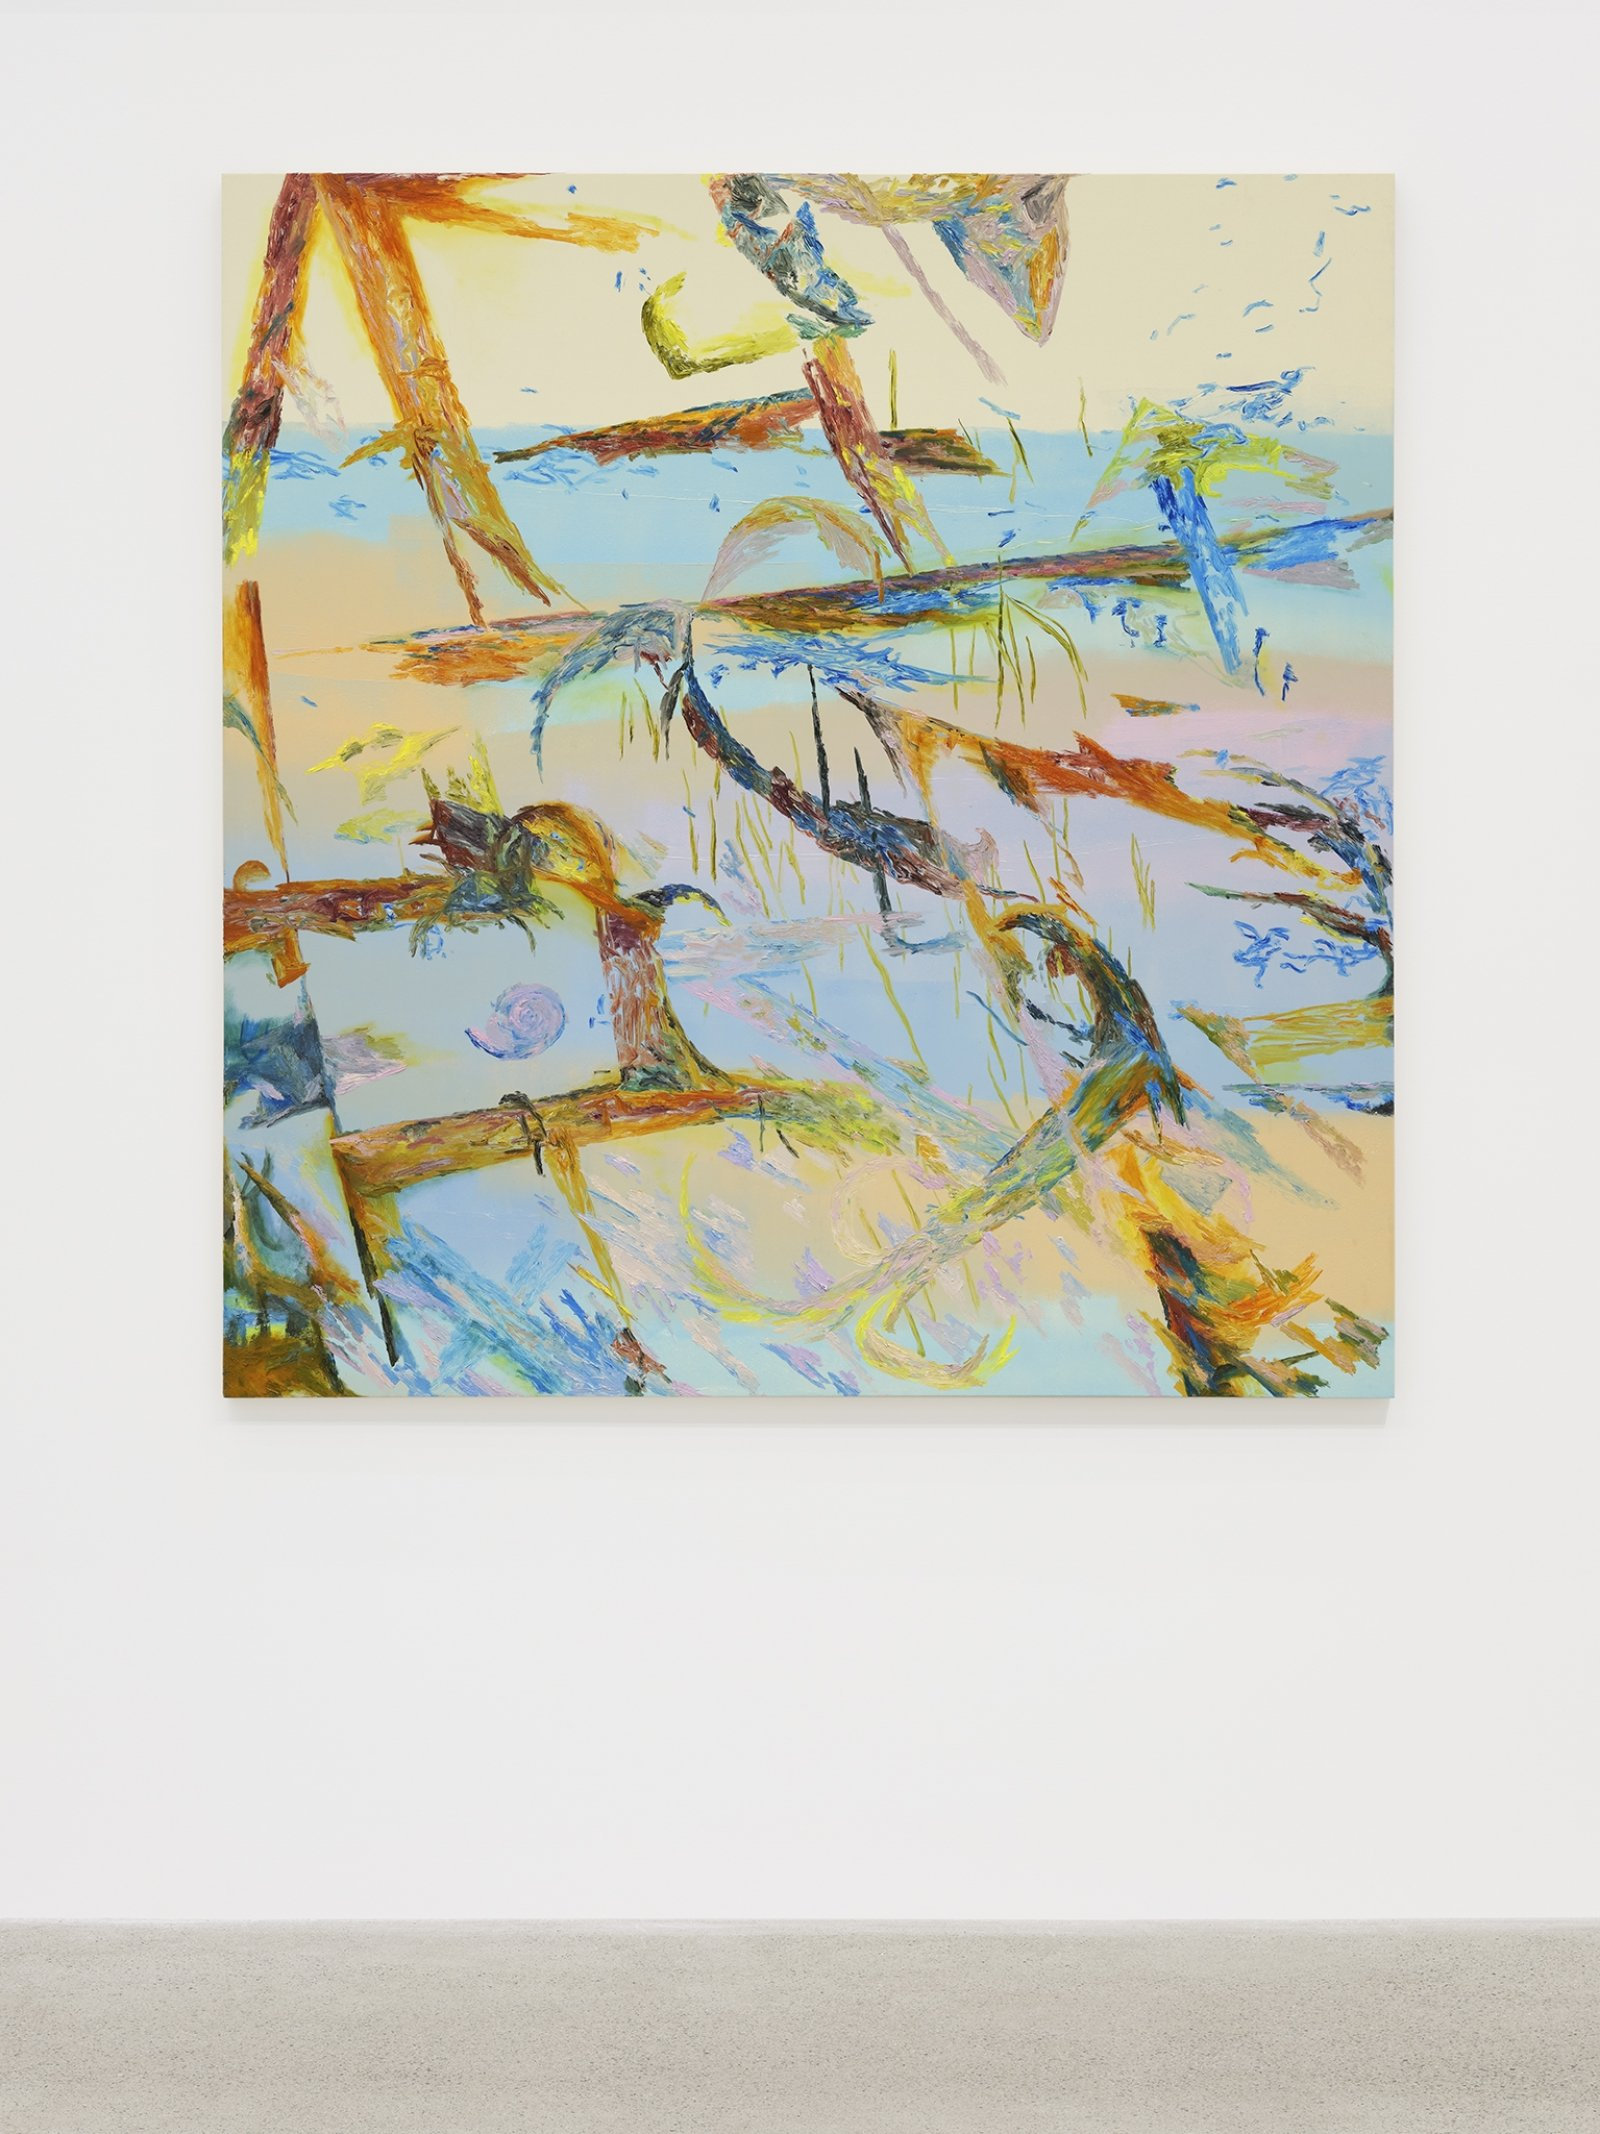 Rebecca Brewer, Makena Beach, 1984, 2019, oil on wood panel, 60 x 57 in. (152 x 145 cm)